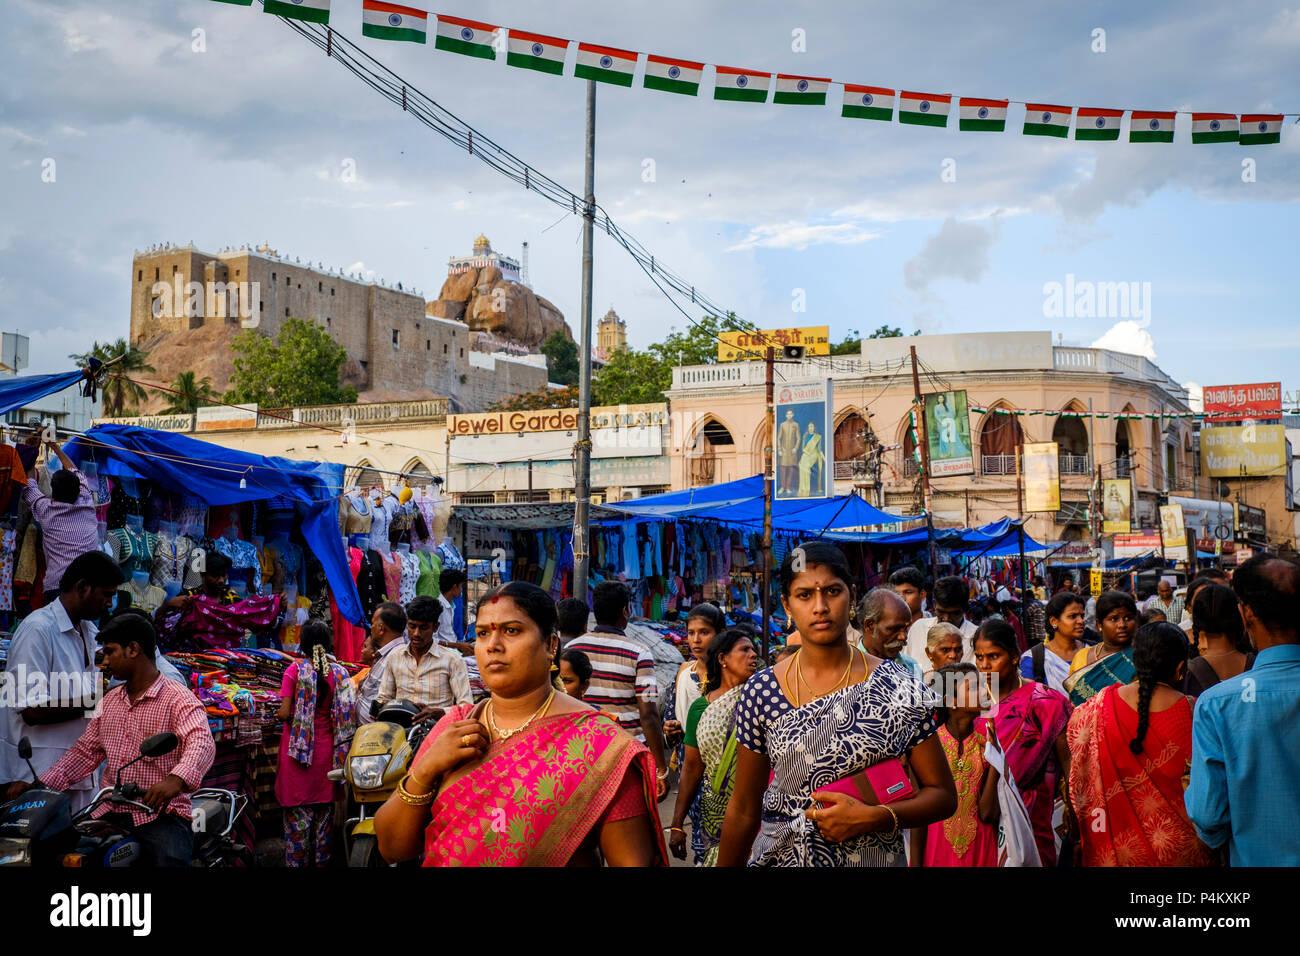 Ucchi Pillayar Temple on RockFort overlooks the street market on Netaji Subhas Chandra Bose Rd, Tiruchirappalli (Trichy), Tamil Nadu, India. - Stock Image